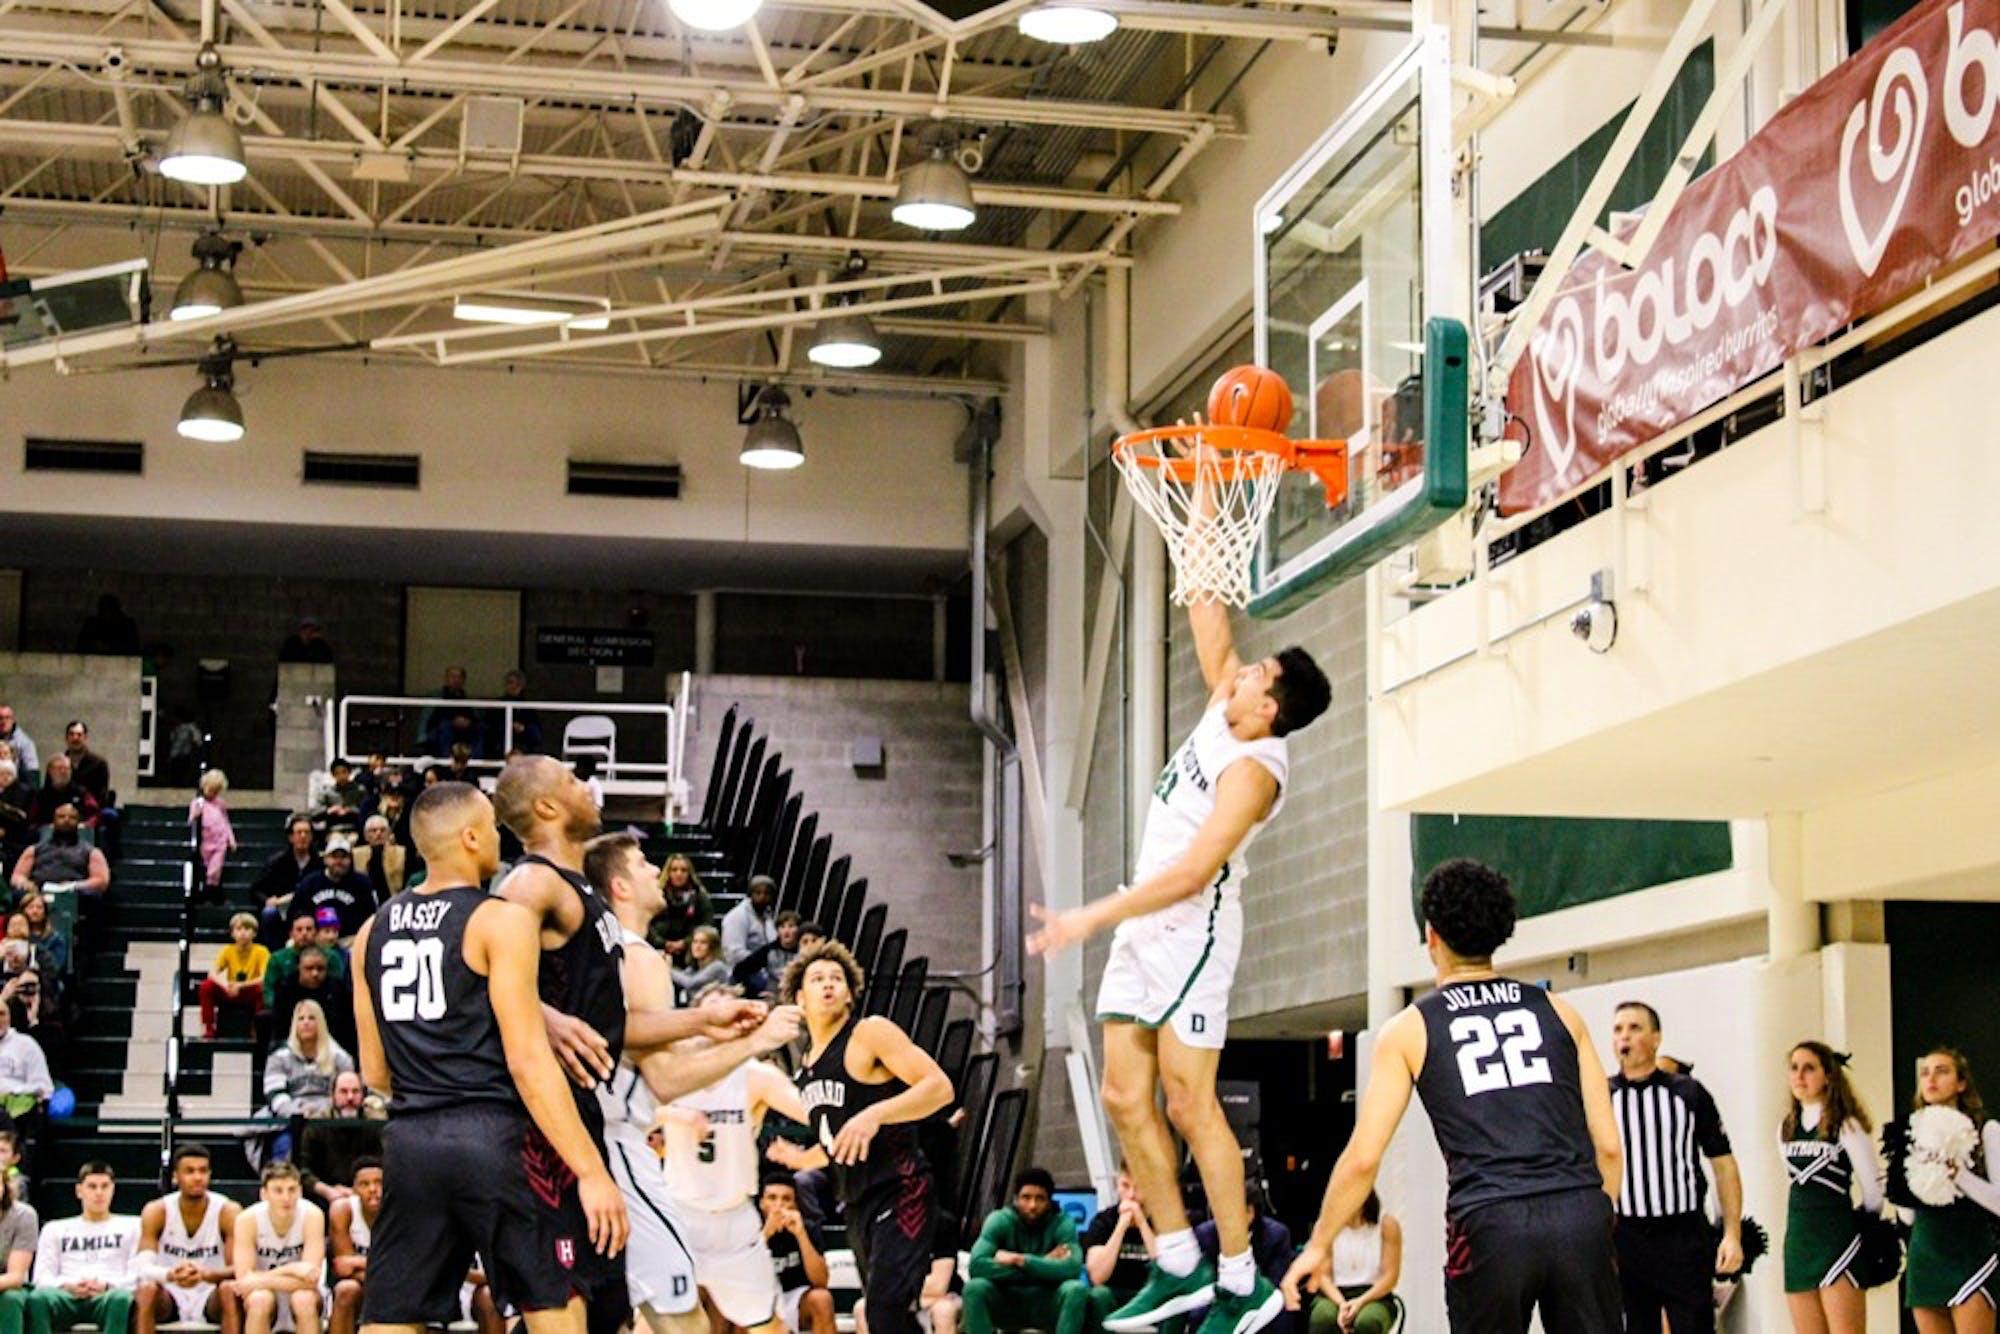 1-27-20-basketball2-lonagirardin